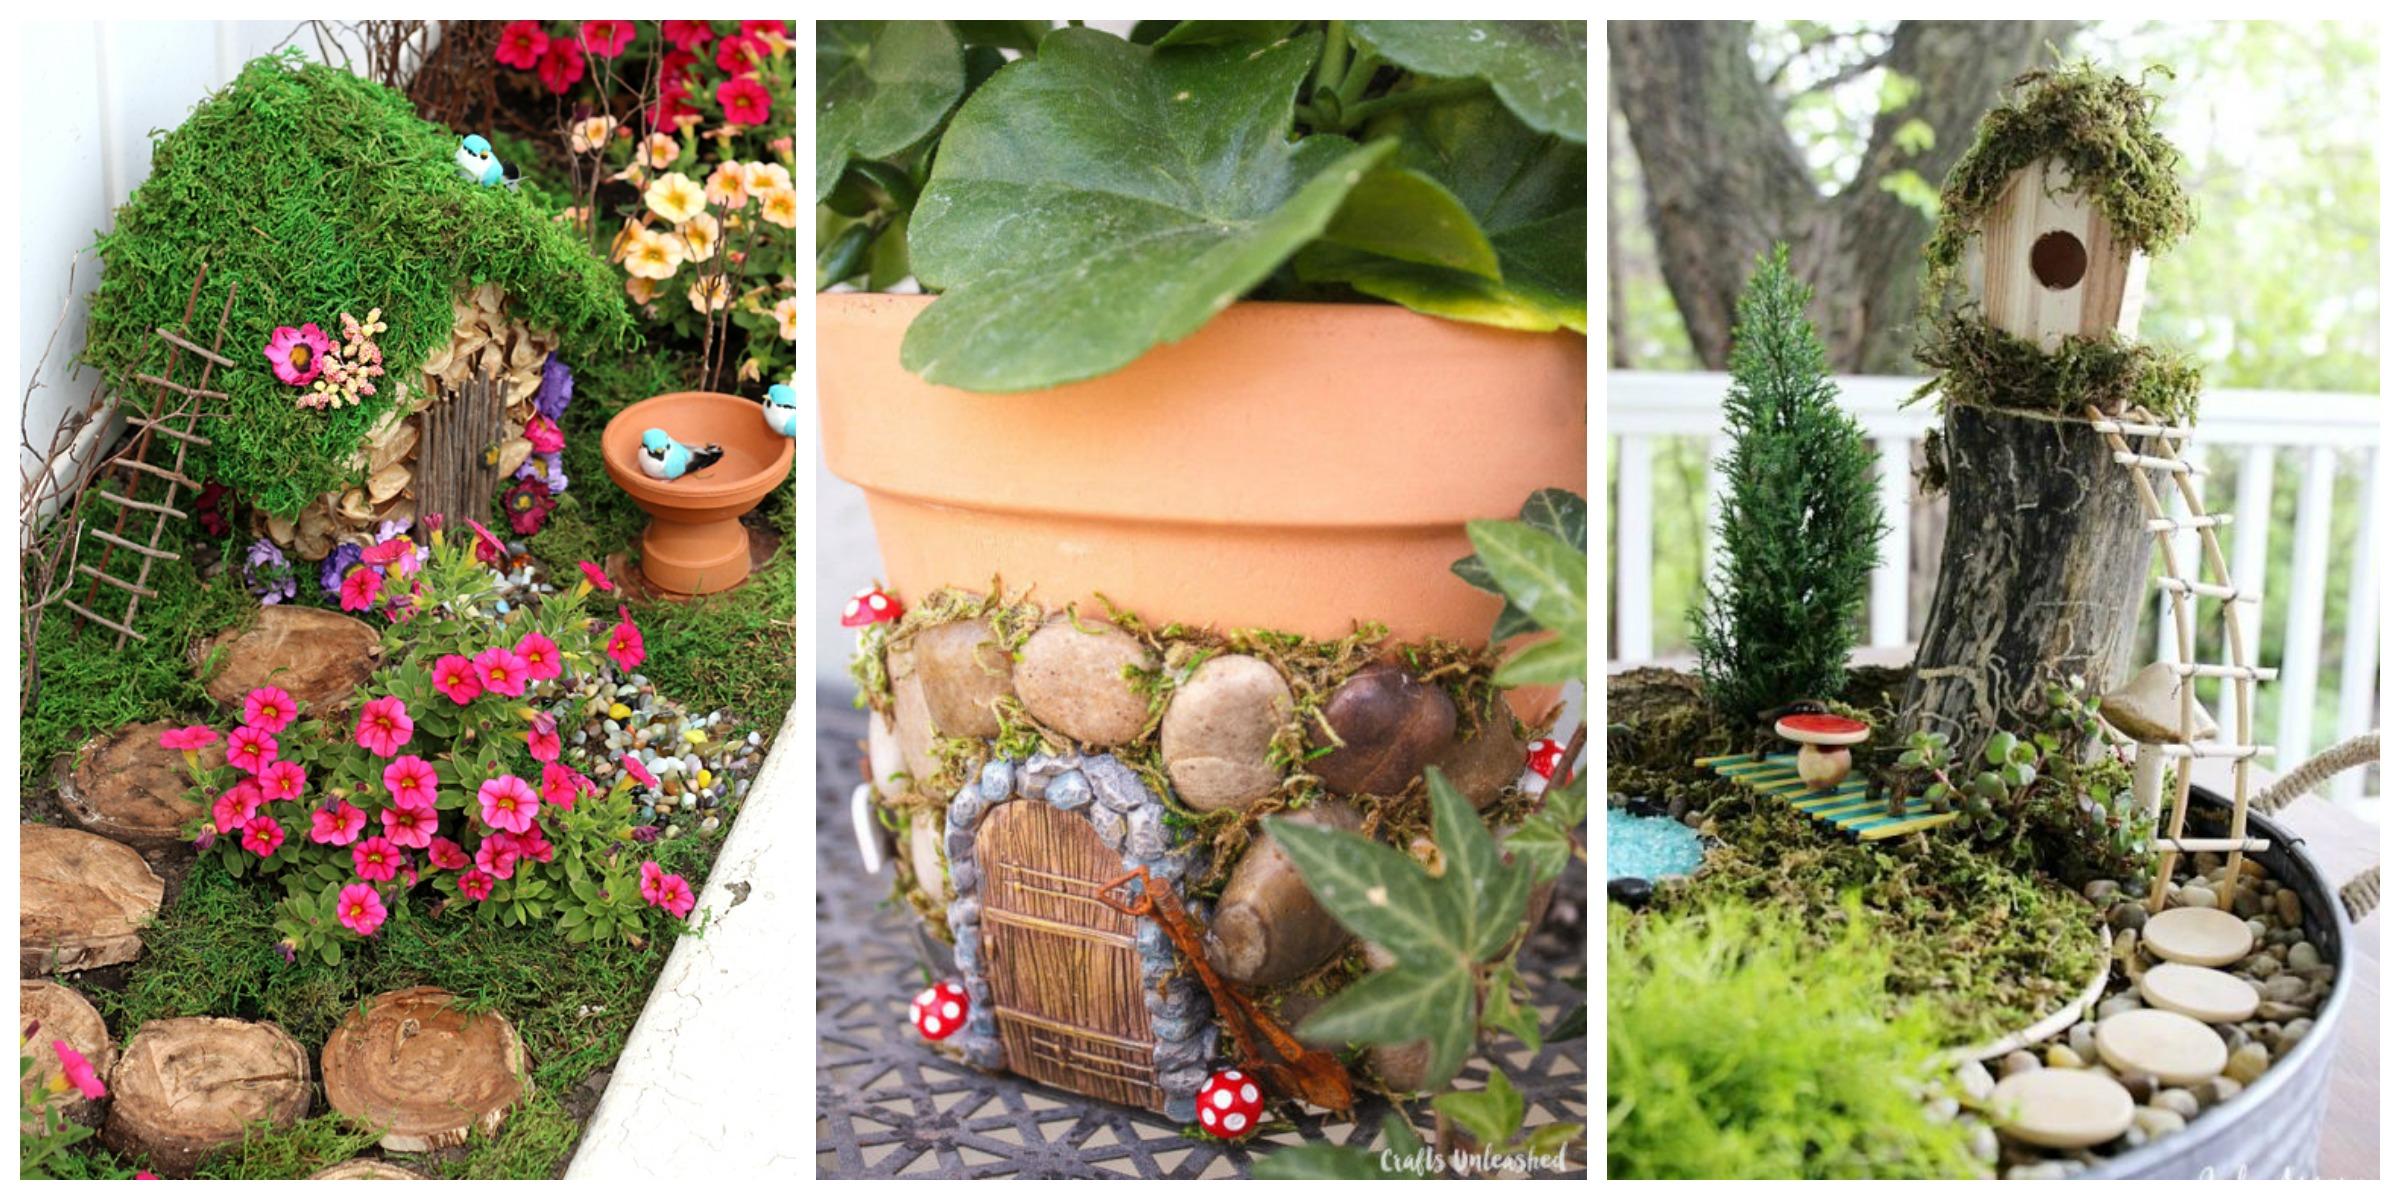 12 diy fairy garden ideas how to make a miniature fairy for Fairy garden ideas diy